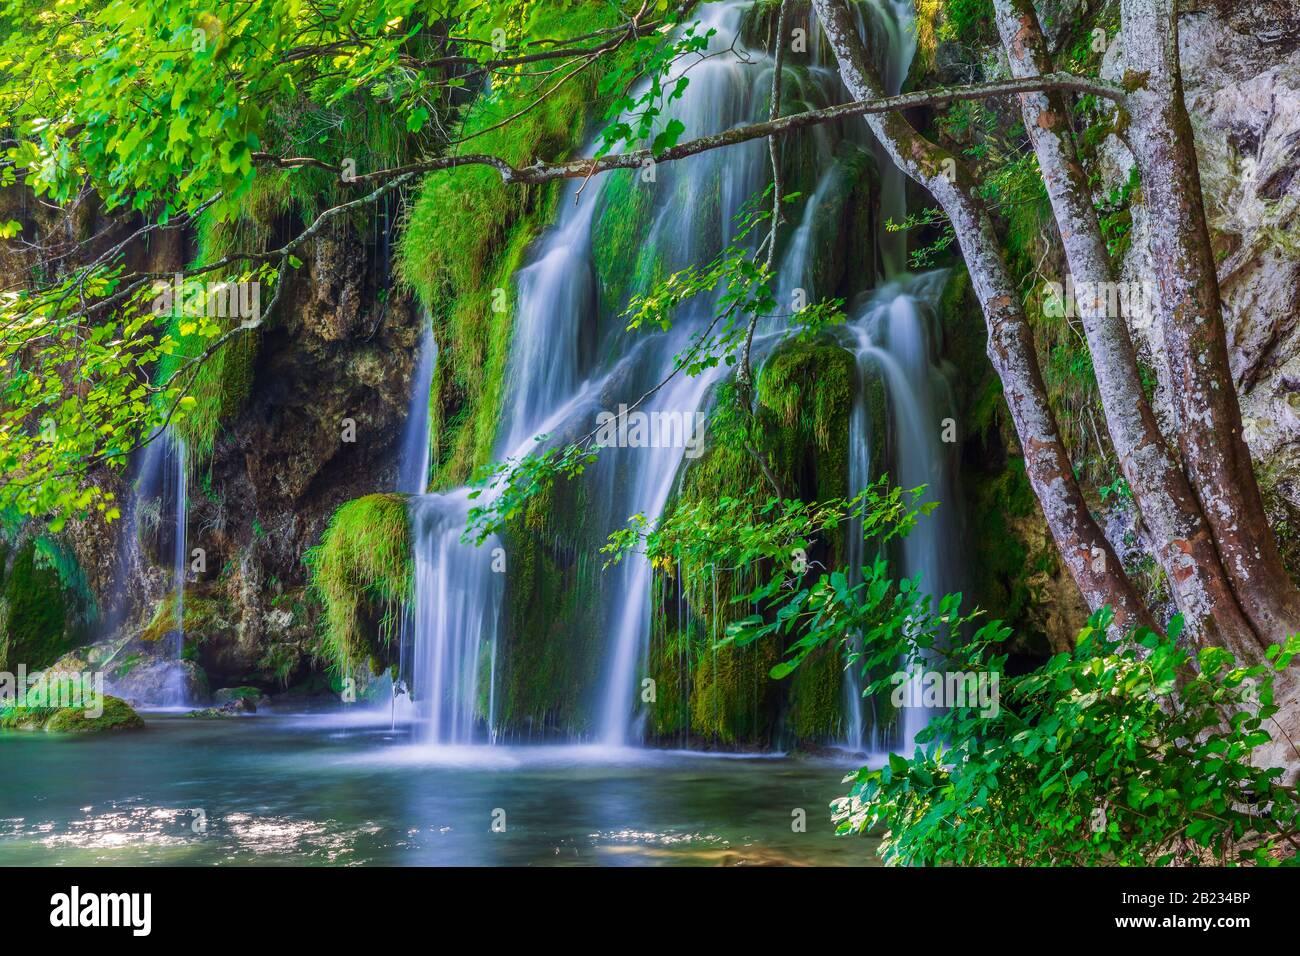 Plitvice lakes, Croatia. Waterfalls of  Plitvice Lakes National Park. Stock Photo